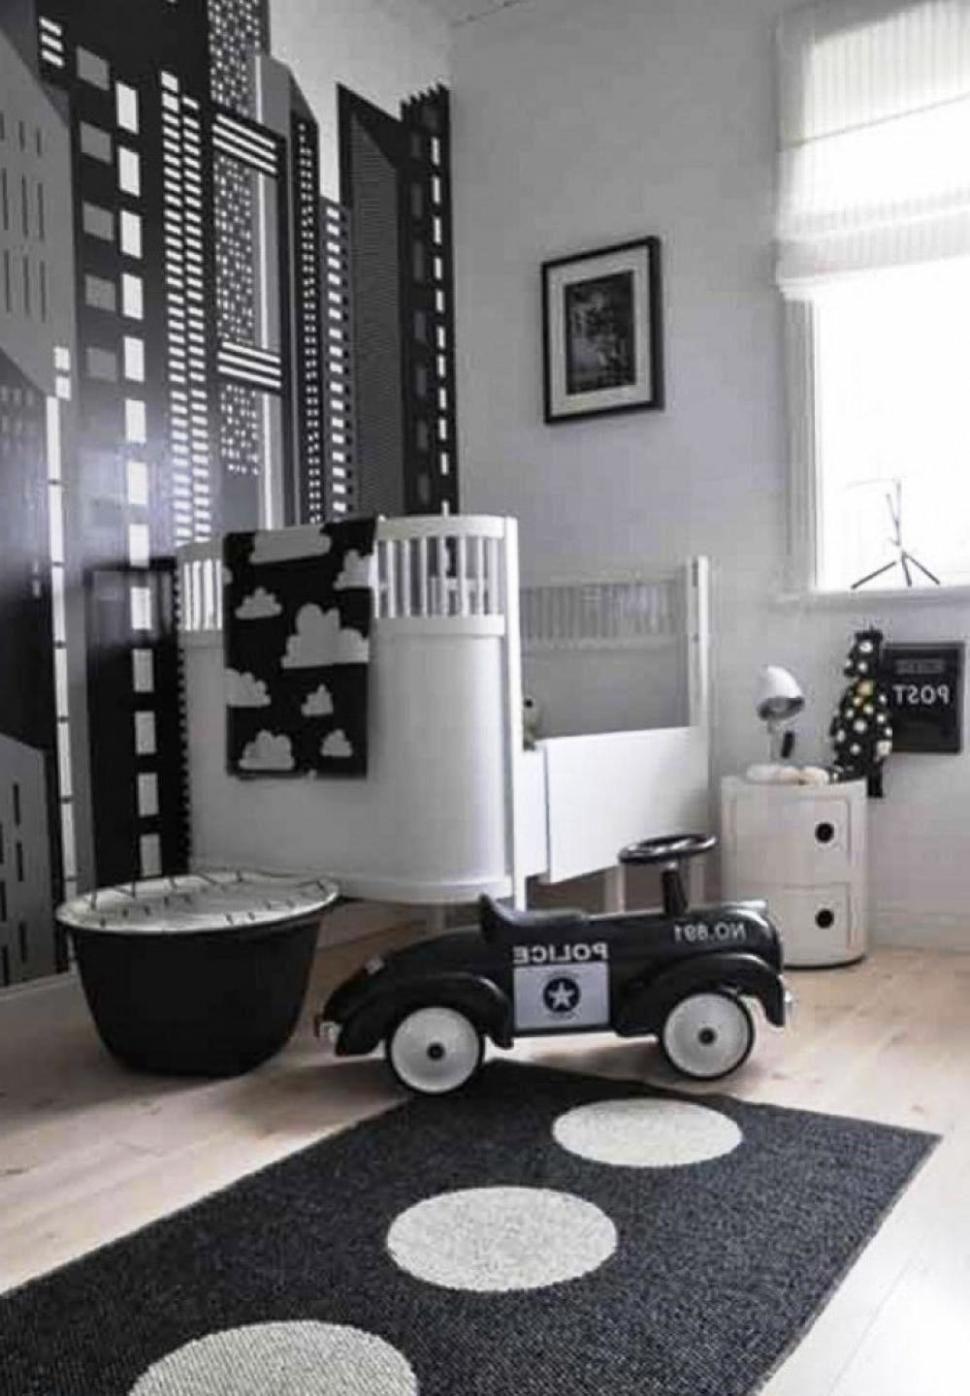 Baby NurseryBlack And White Baby Nursery Decoration Ideas With Wall